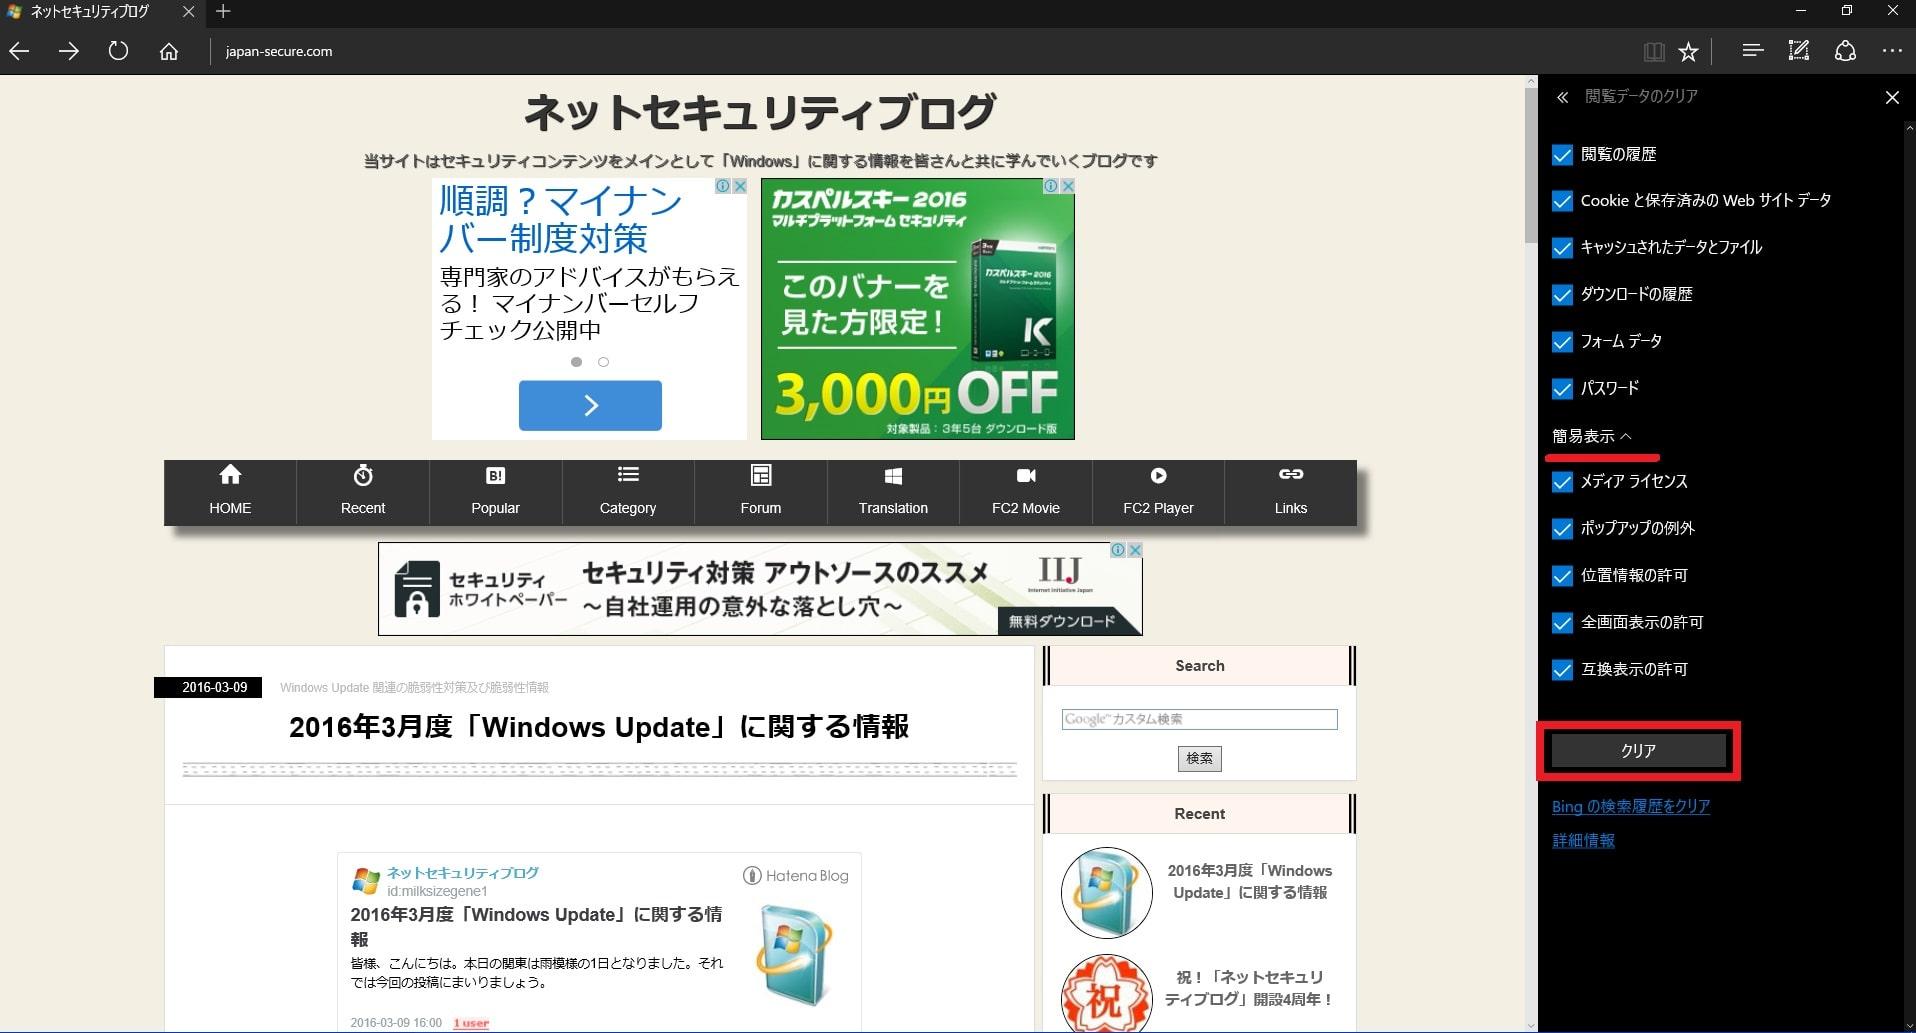 http://art9.photozou.jp/pub/119/2912119/photo/234182766_org.v1457524361.jpg